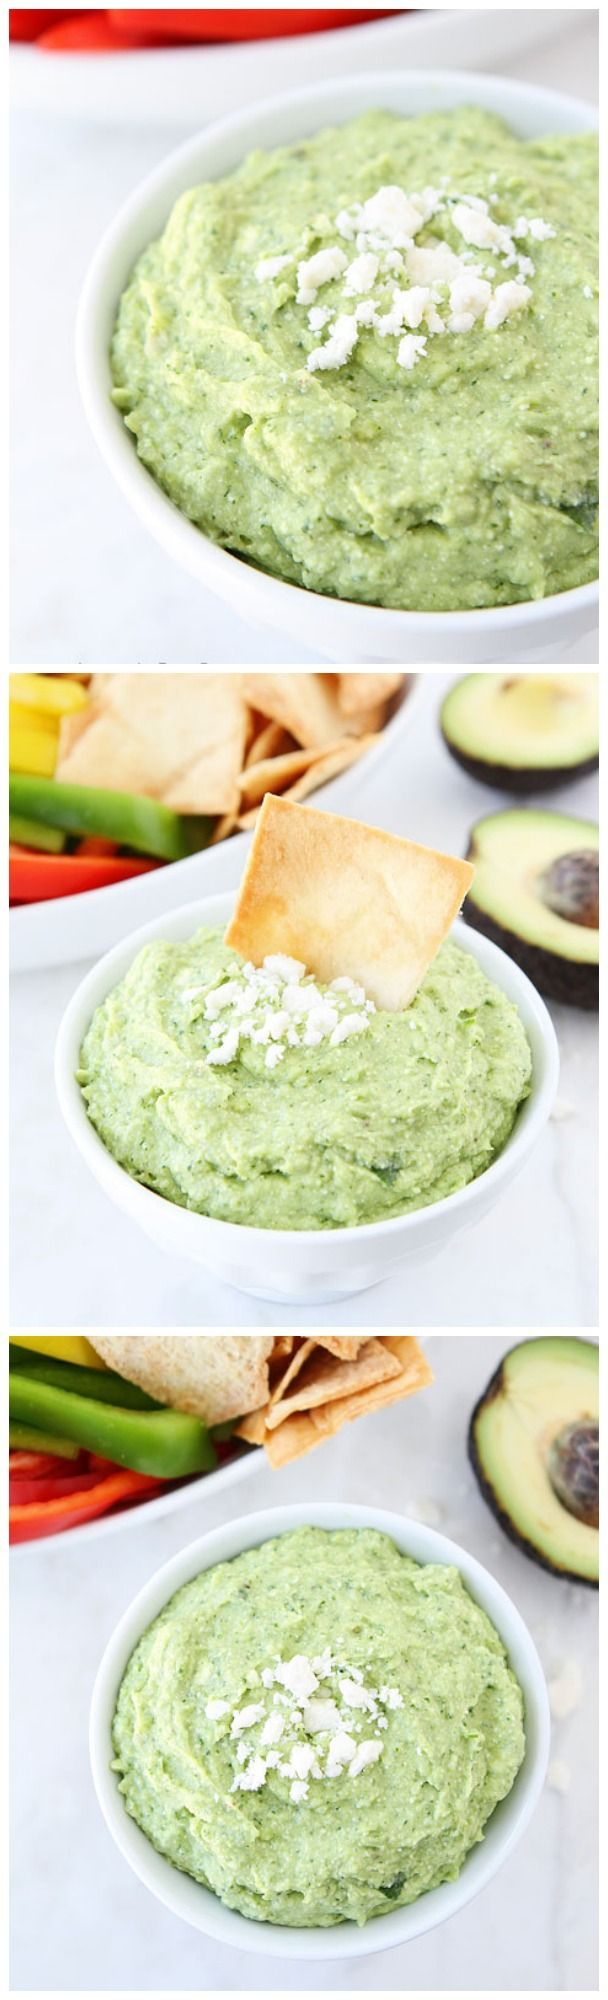 Avocado Feta Dip Recipe on twopeasandtheirpod.com Perfect for your Super Bowl party!